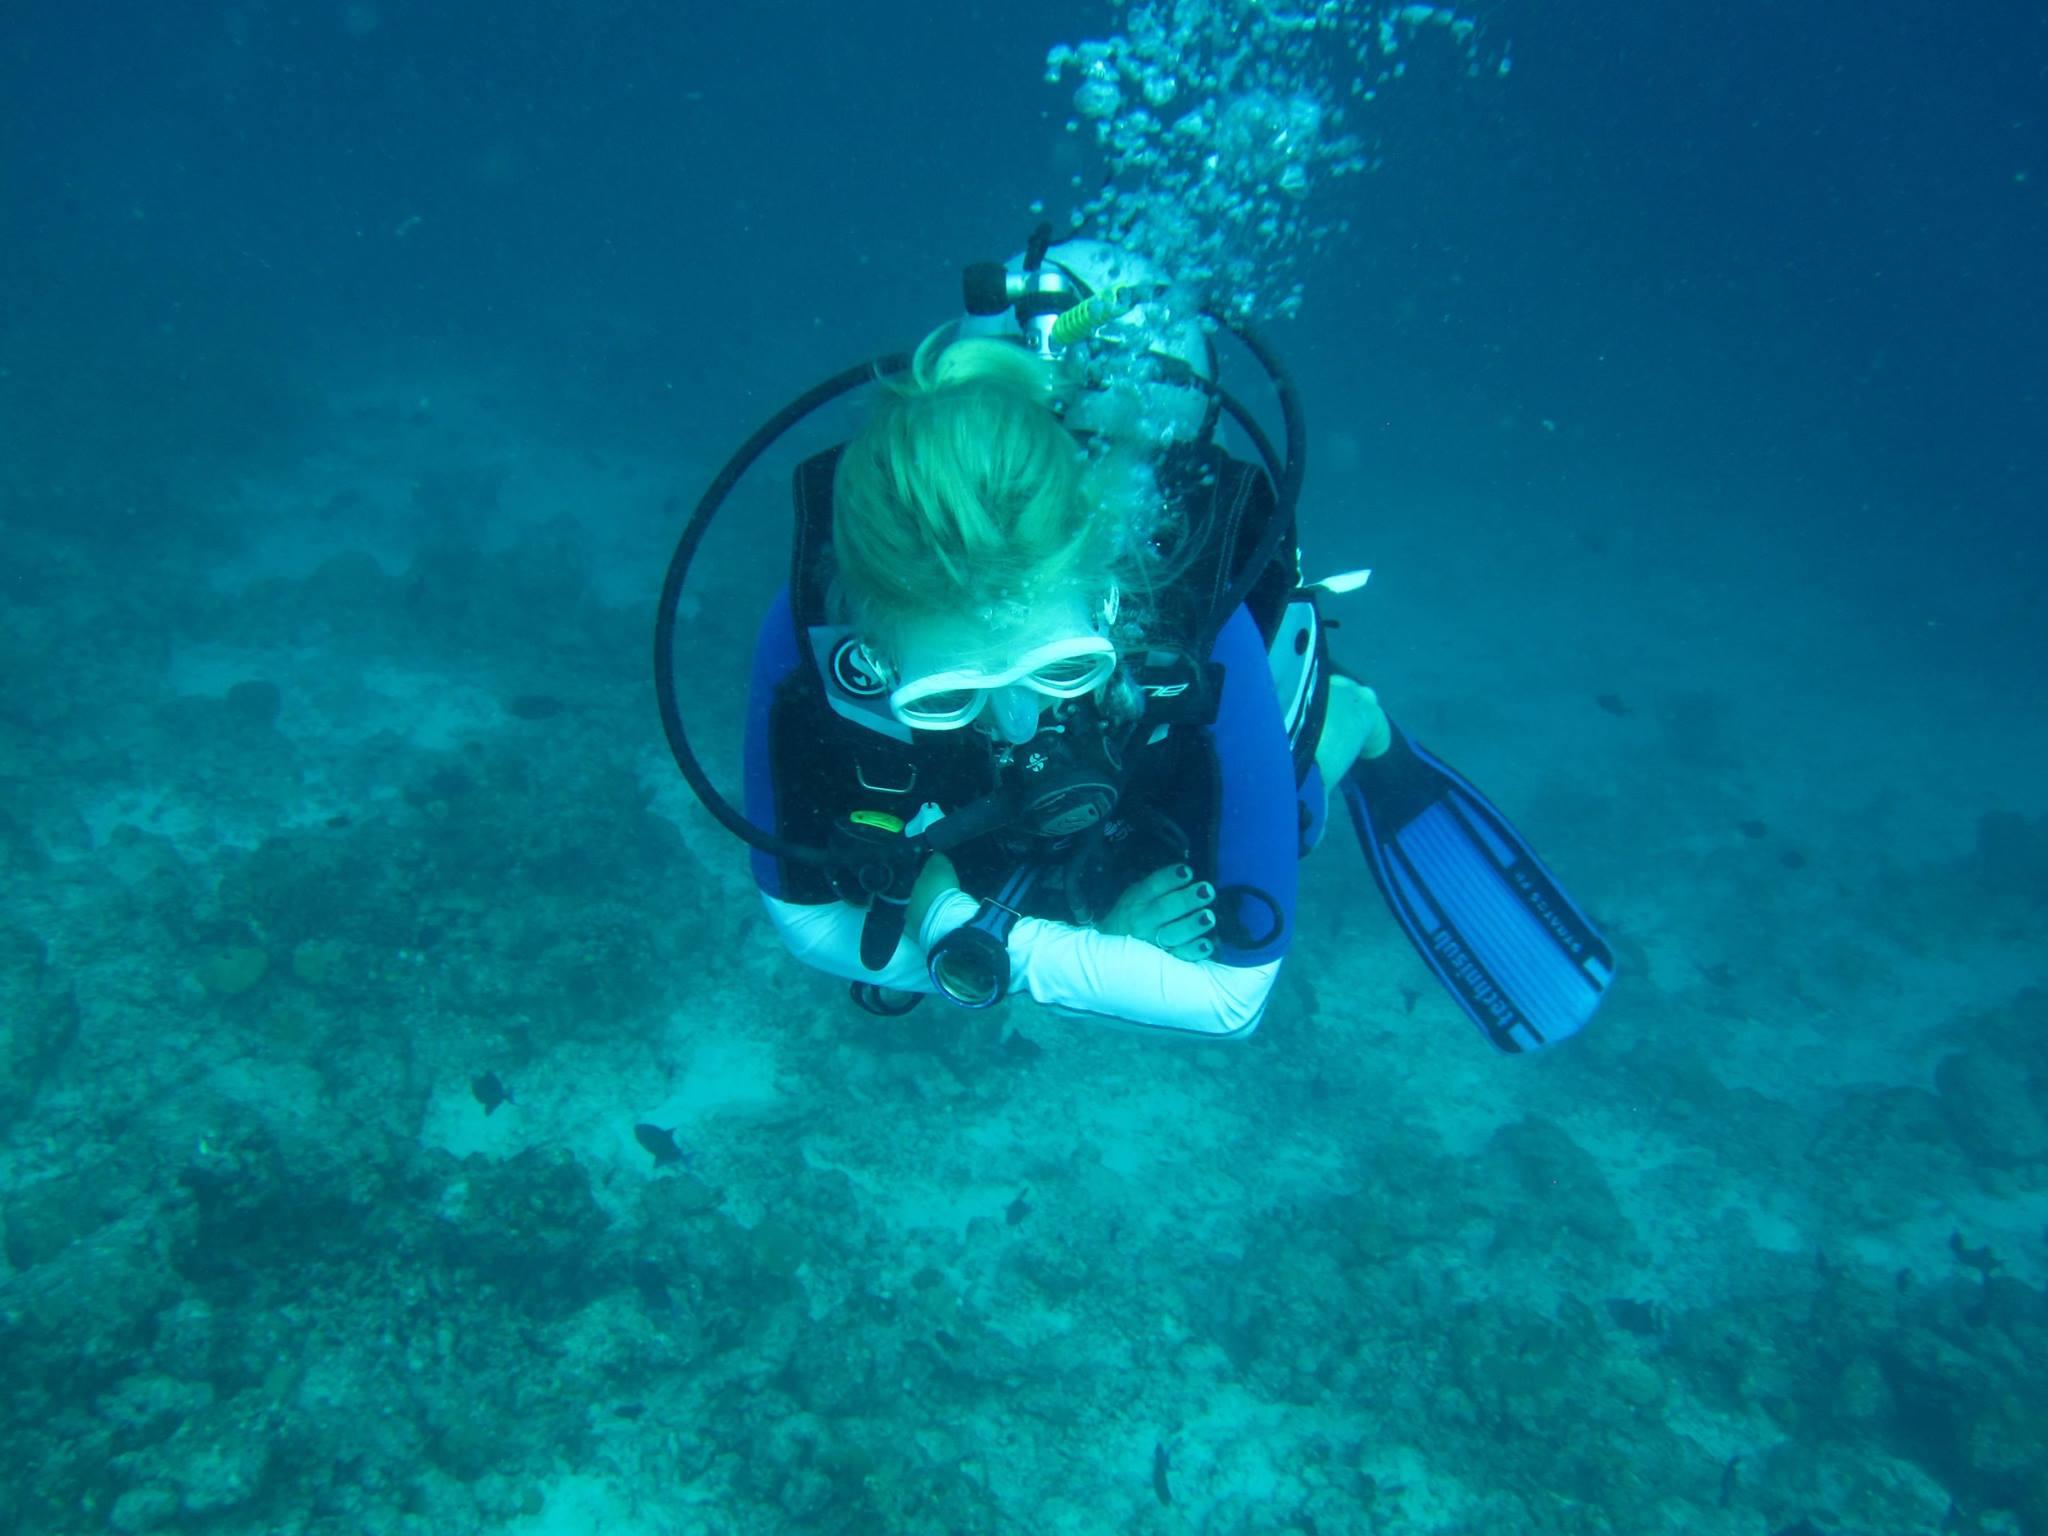 invite-to-paradise-sri-lanka-and-maldives-specialists-travel-agent-tour-operator-customer-review--feedback-joel-rhian-atmopshere-kanifushi-diving.jpg